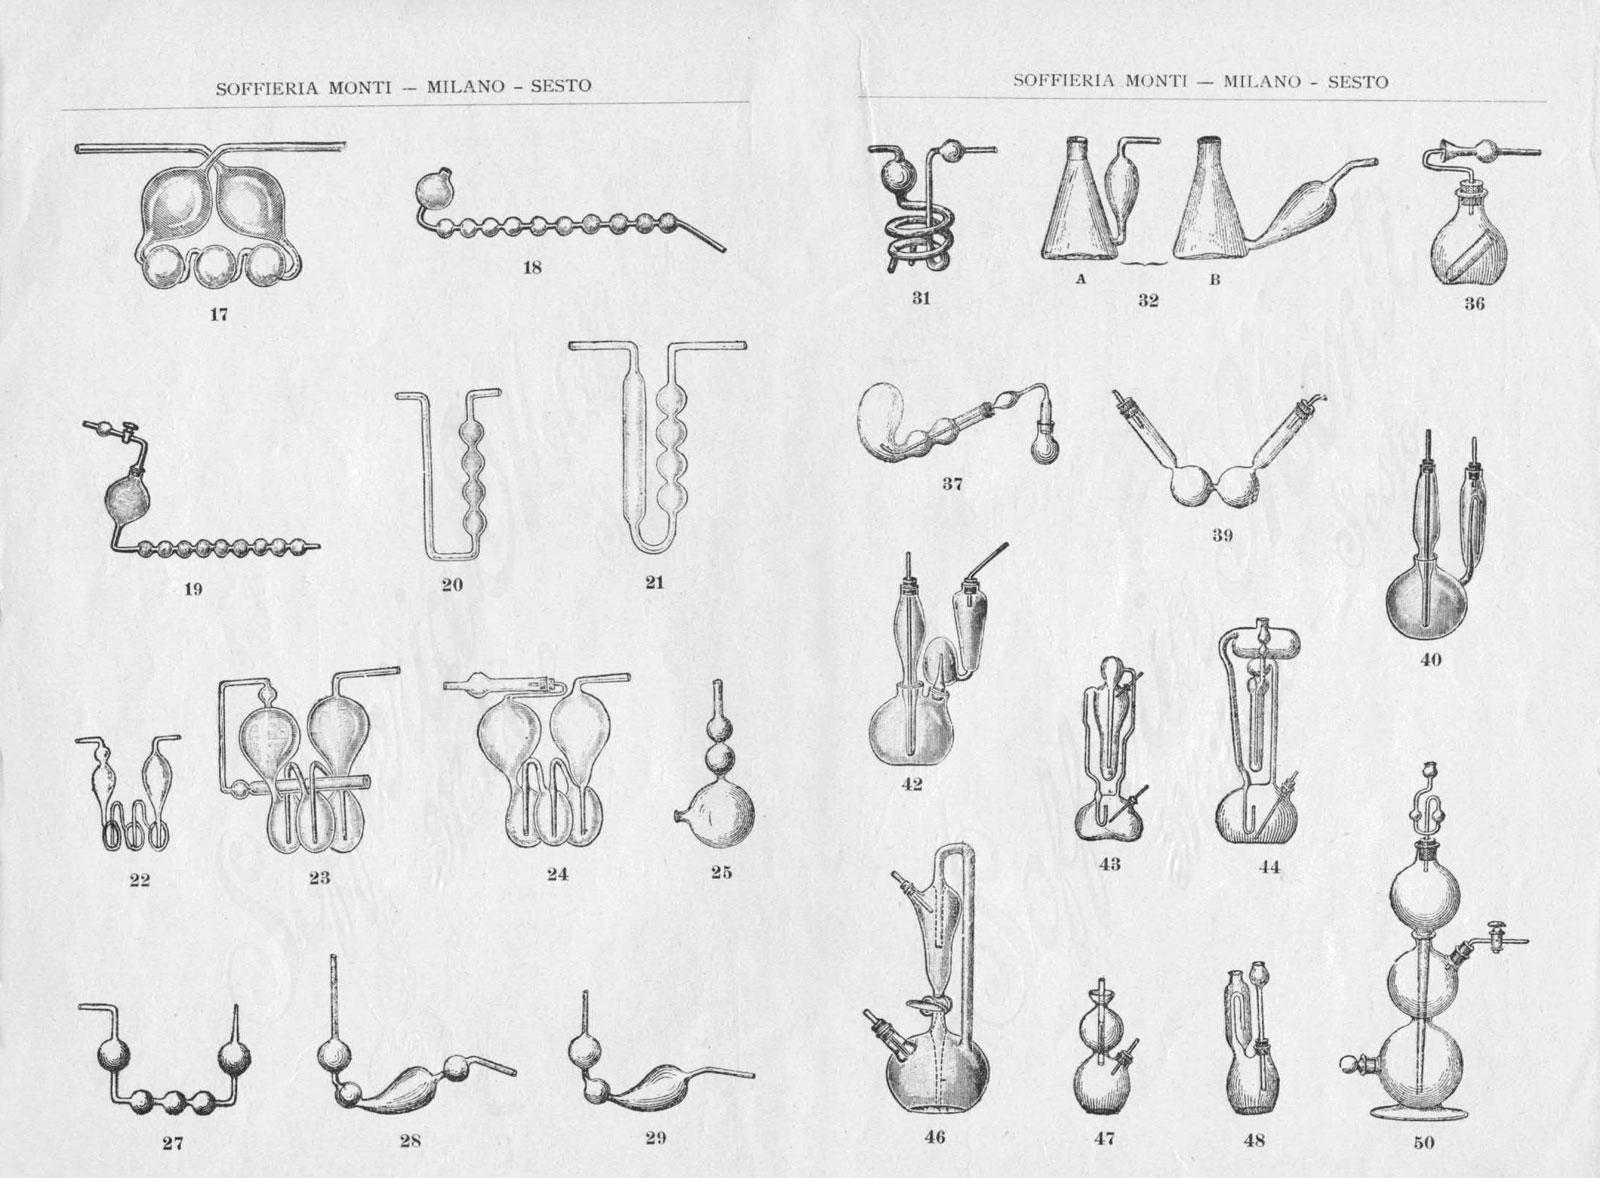 catalogo storico Soffieria Monti Dal 1983